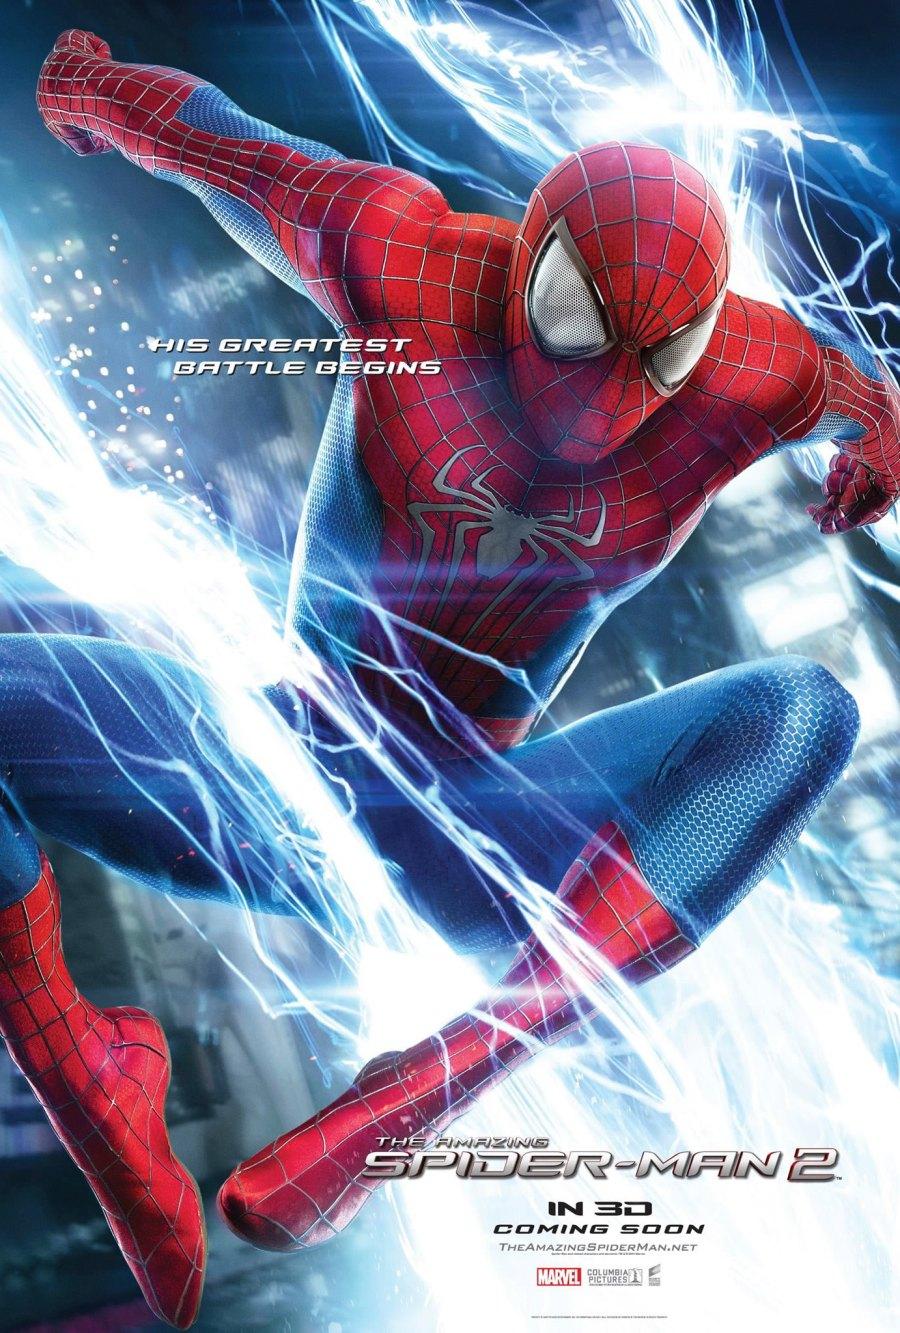 O-Espetacular-Homem-Aranha-2-poster-17jan2014-02